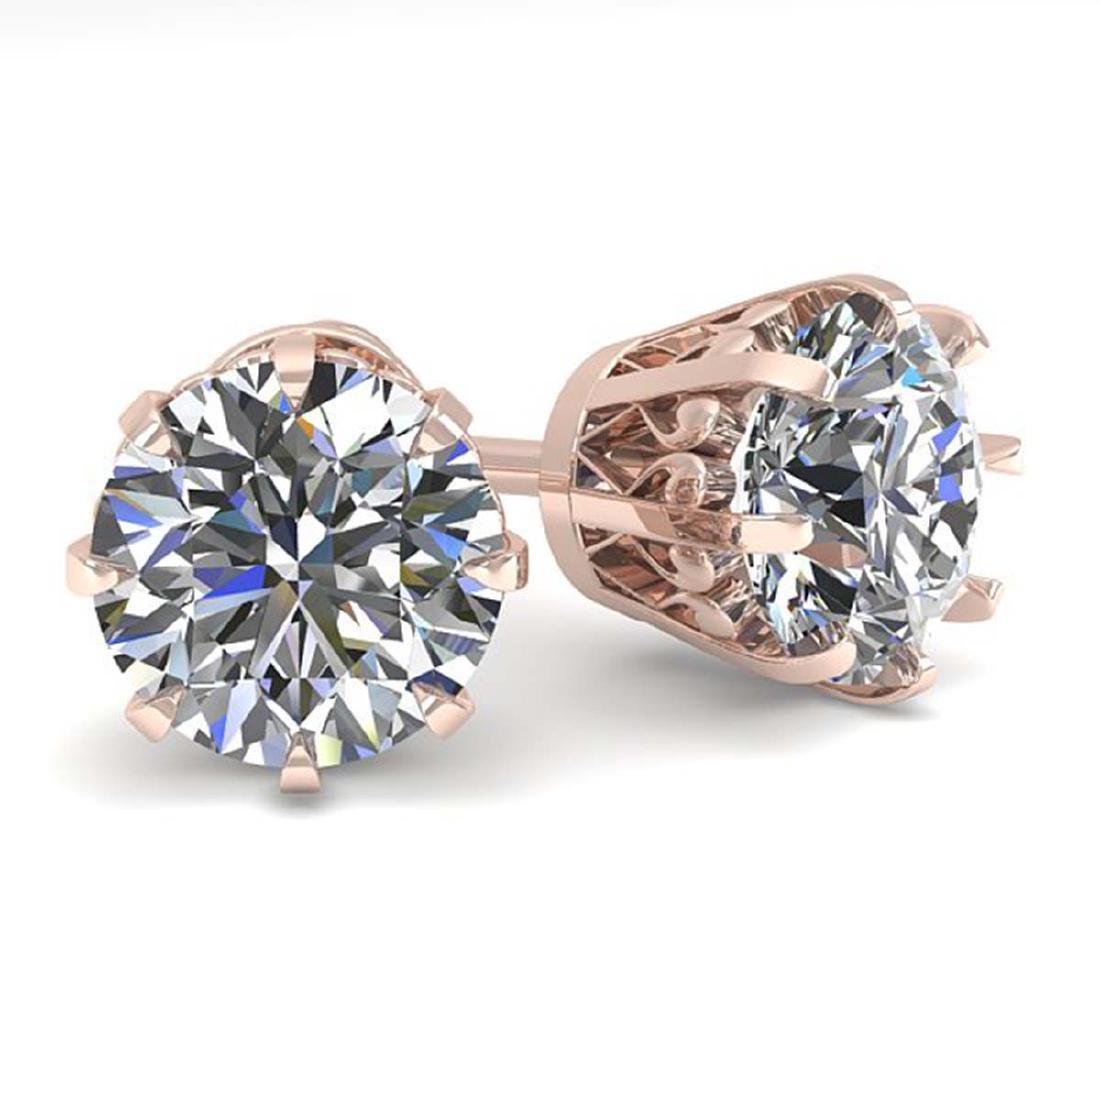 2.50 ctw VS/SI Diamond Stud Solitaire Earrings 14K Rose